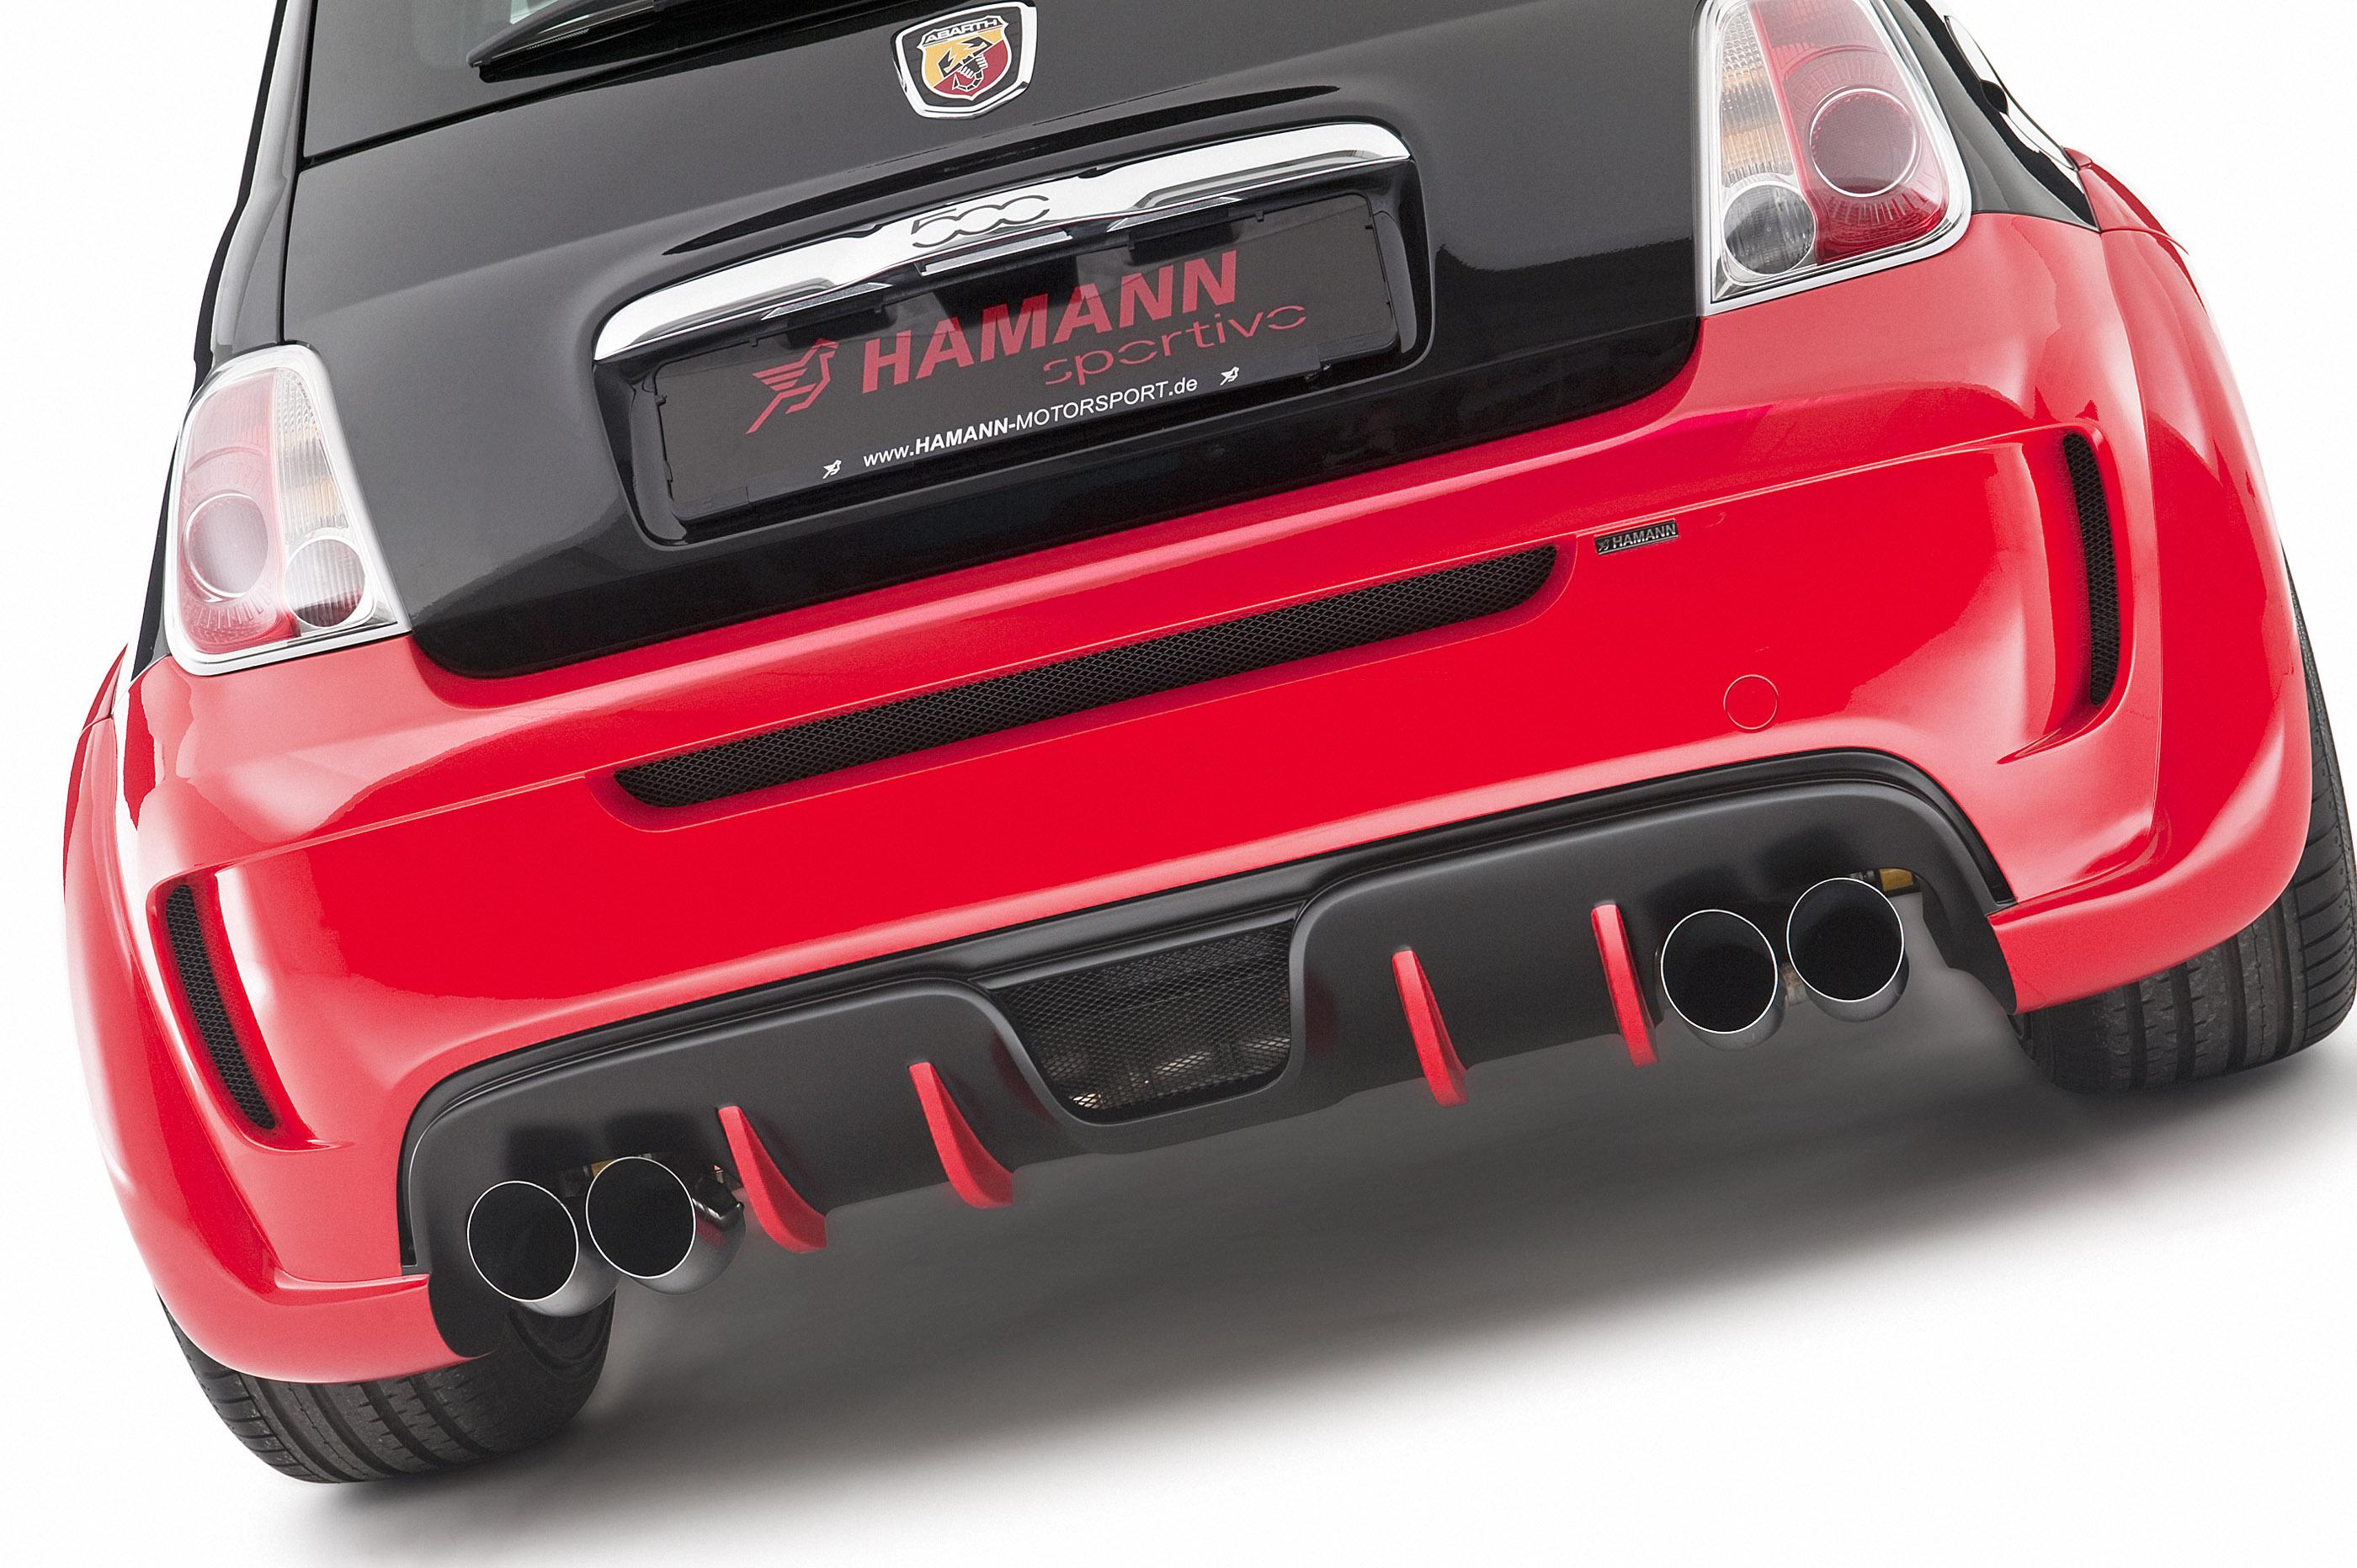 HAMANN Fiat 500 Abarth - Picture 34685